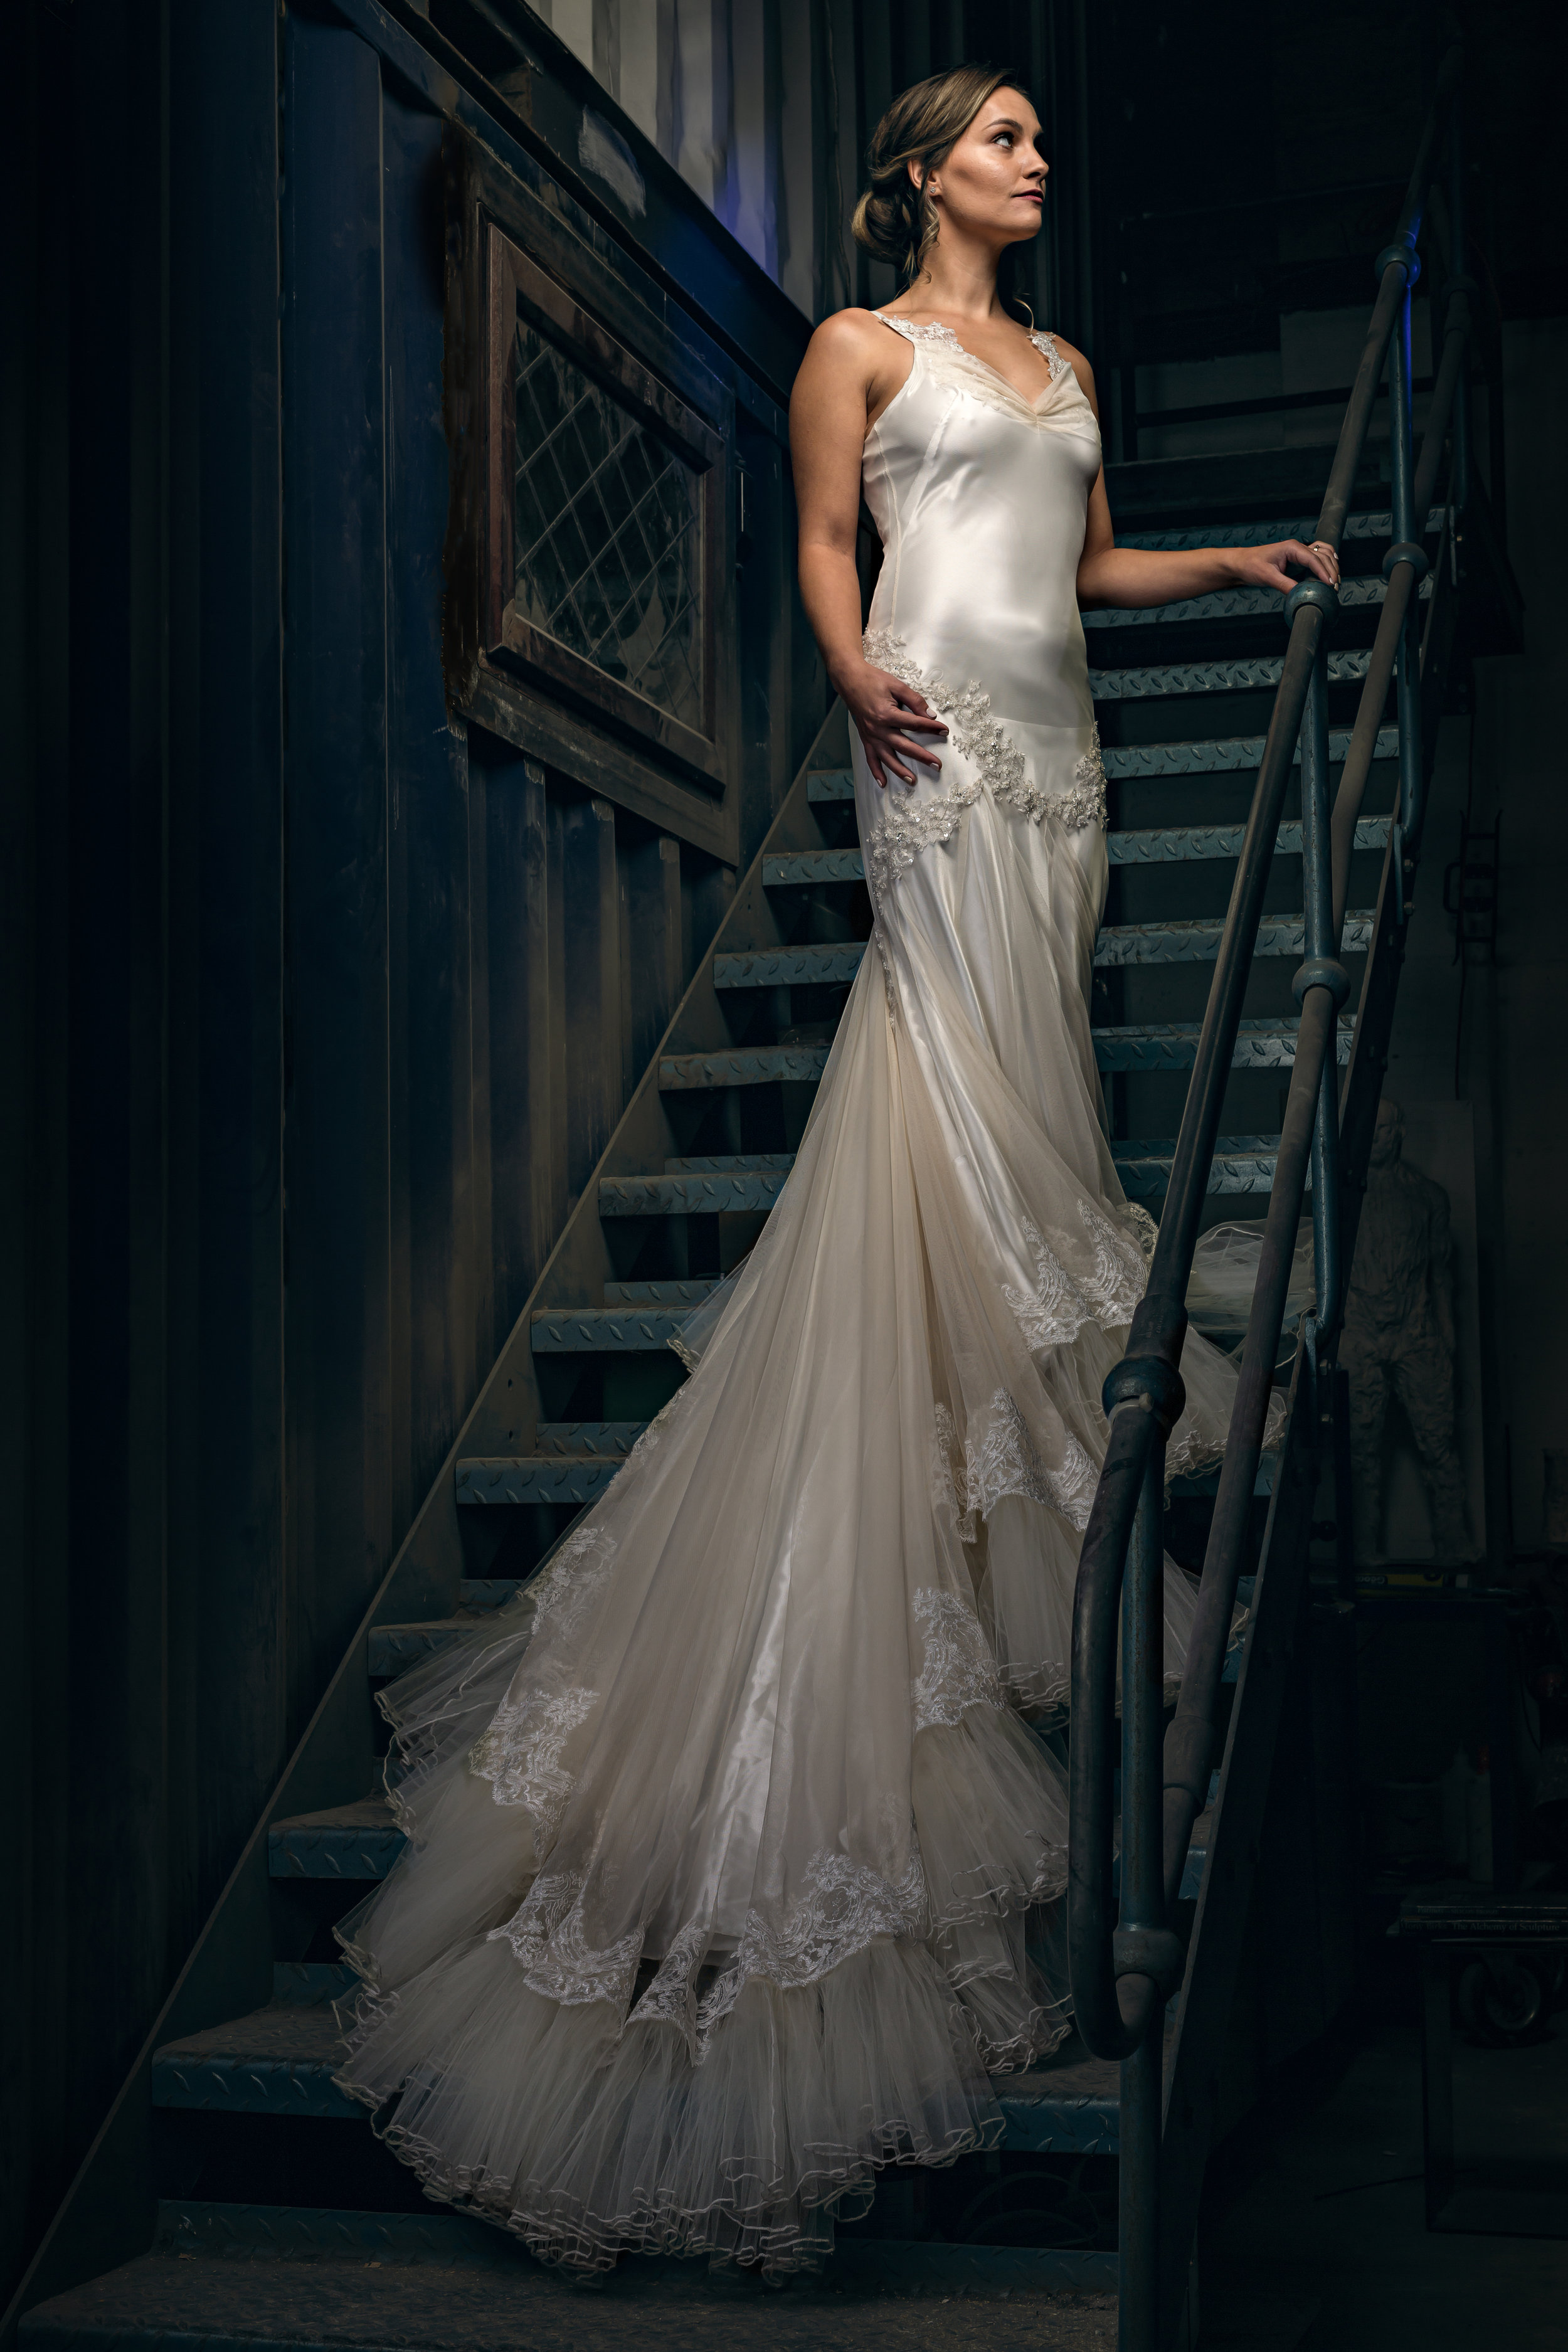 Martin Dobson Couture - Bespoke wedding dress - Suffolk - 0239 - September 17, 2017 - copyright Foyers Photography-Edit--® Robert Foyers - All Rights Reserved-3840 x 5760.JPG